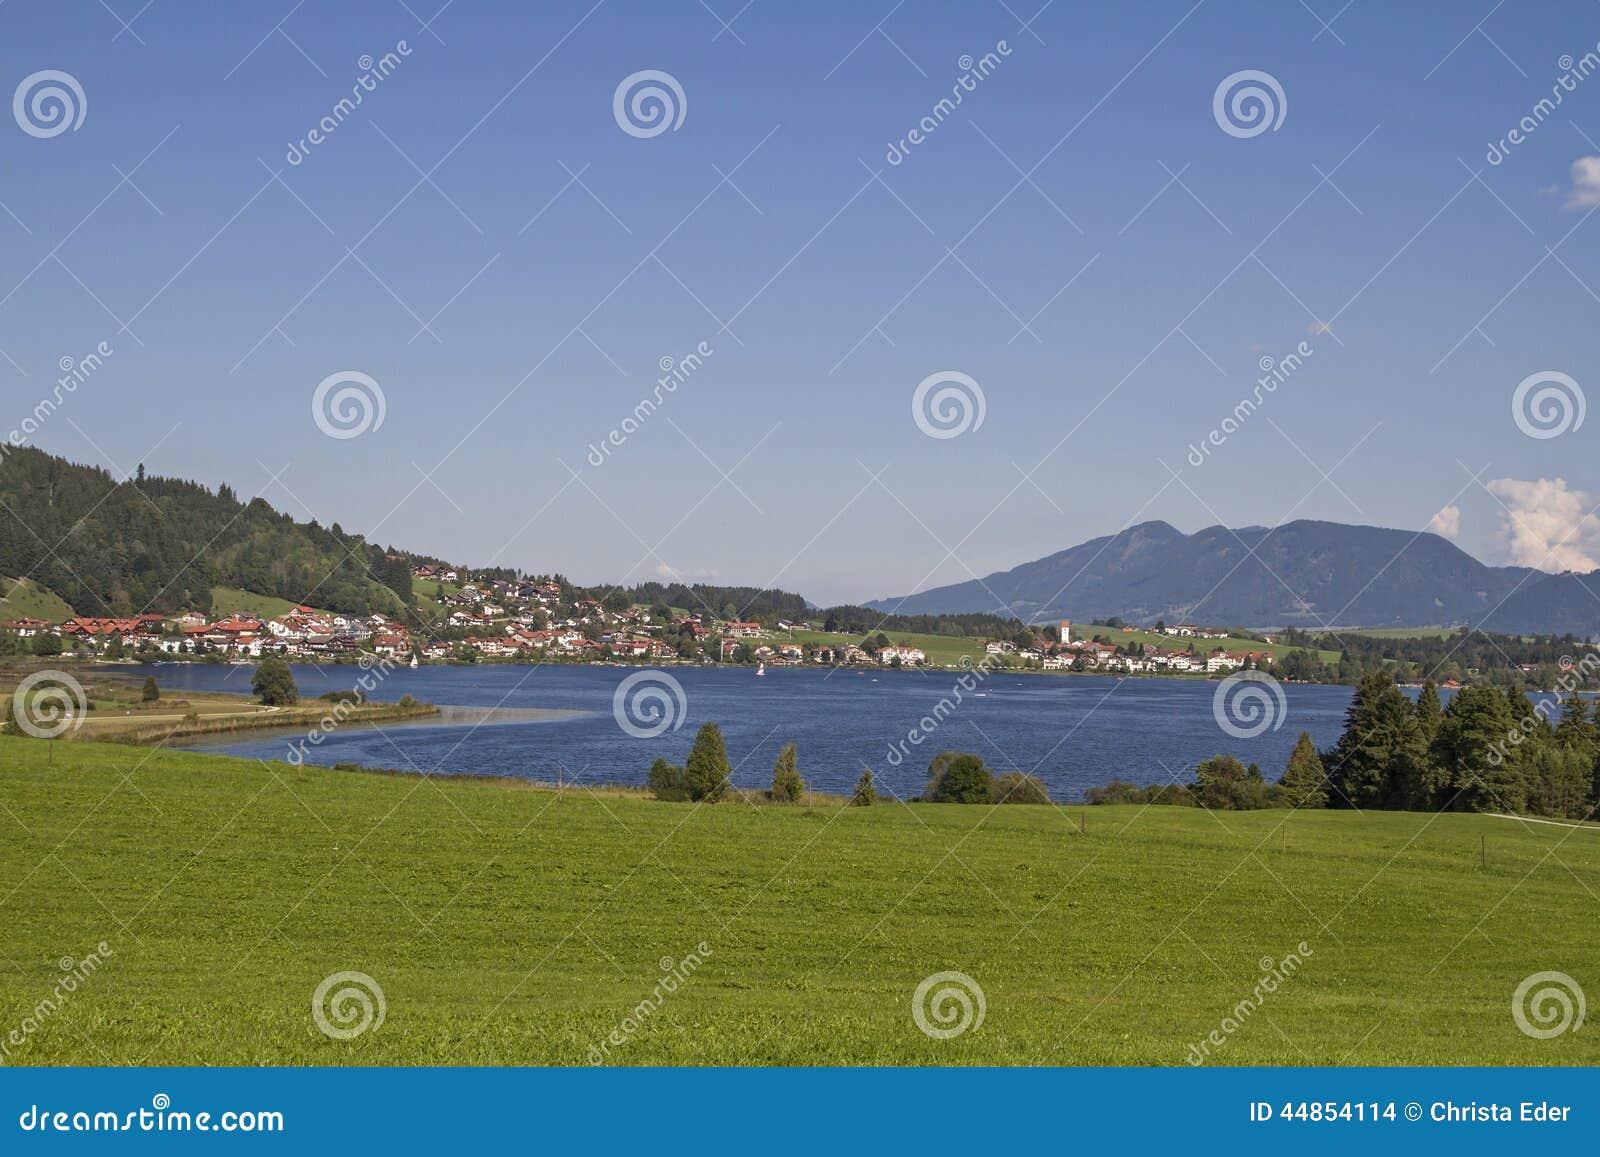 Lago Hopfensee